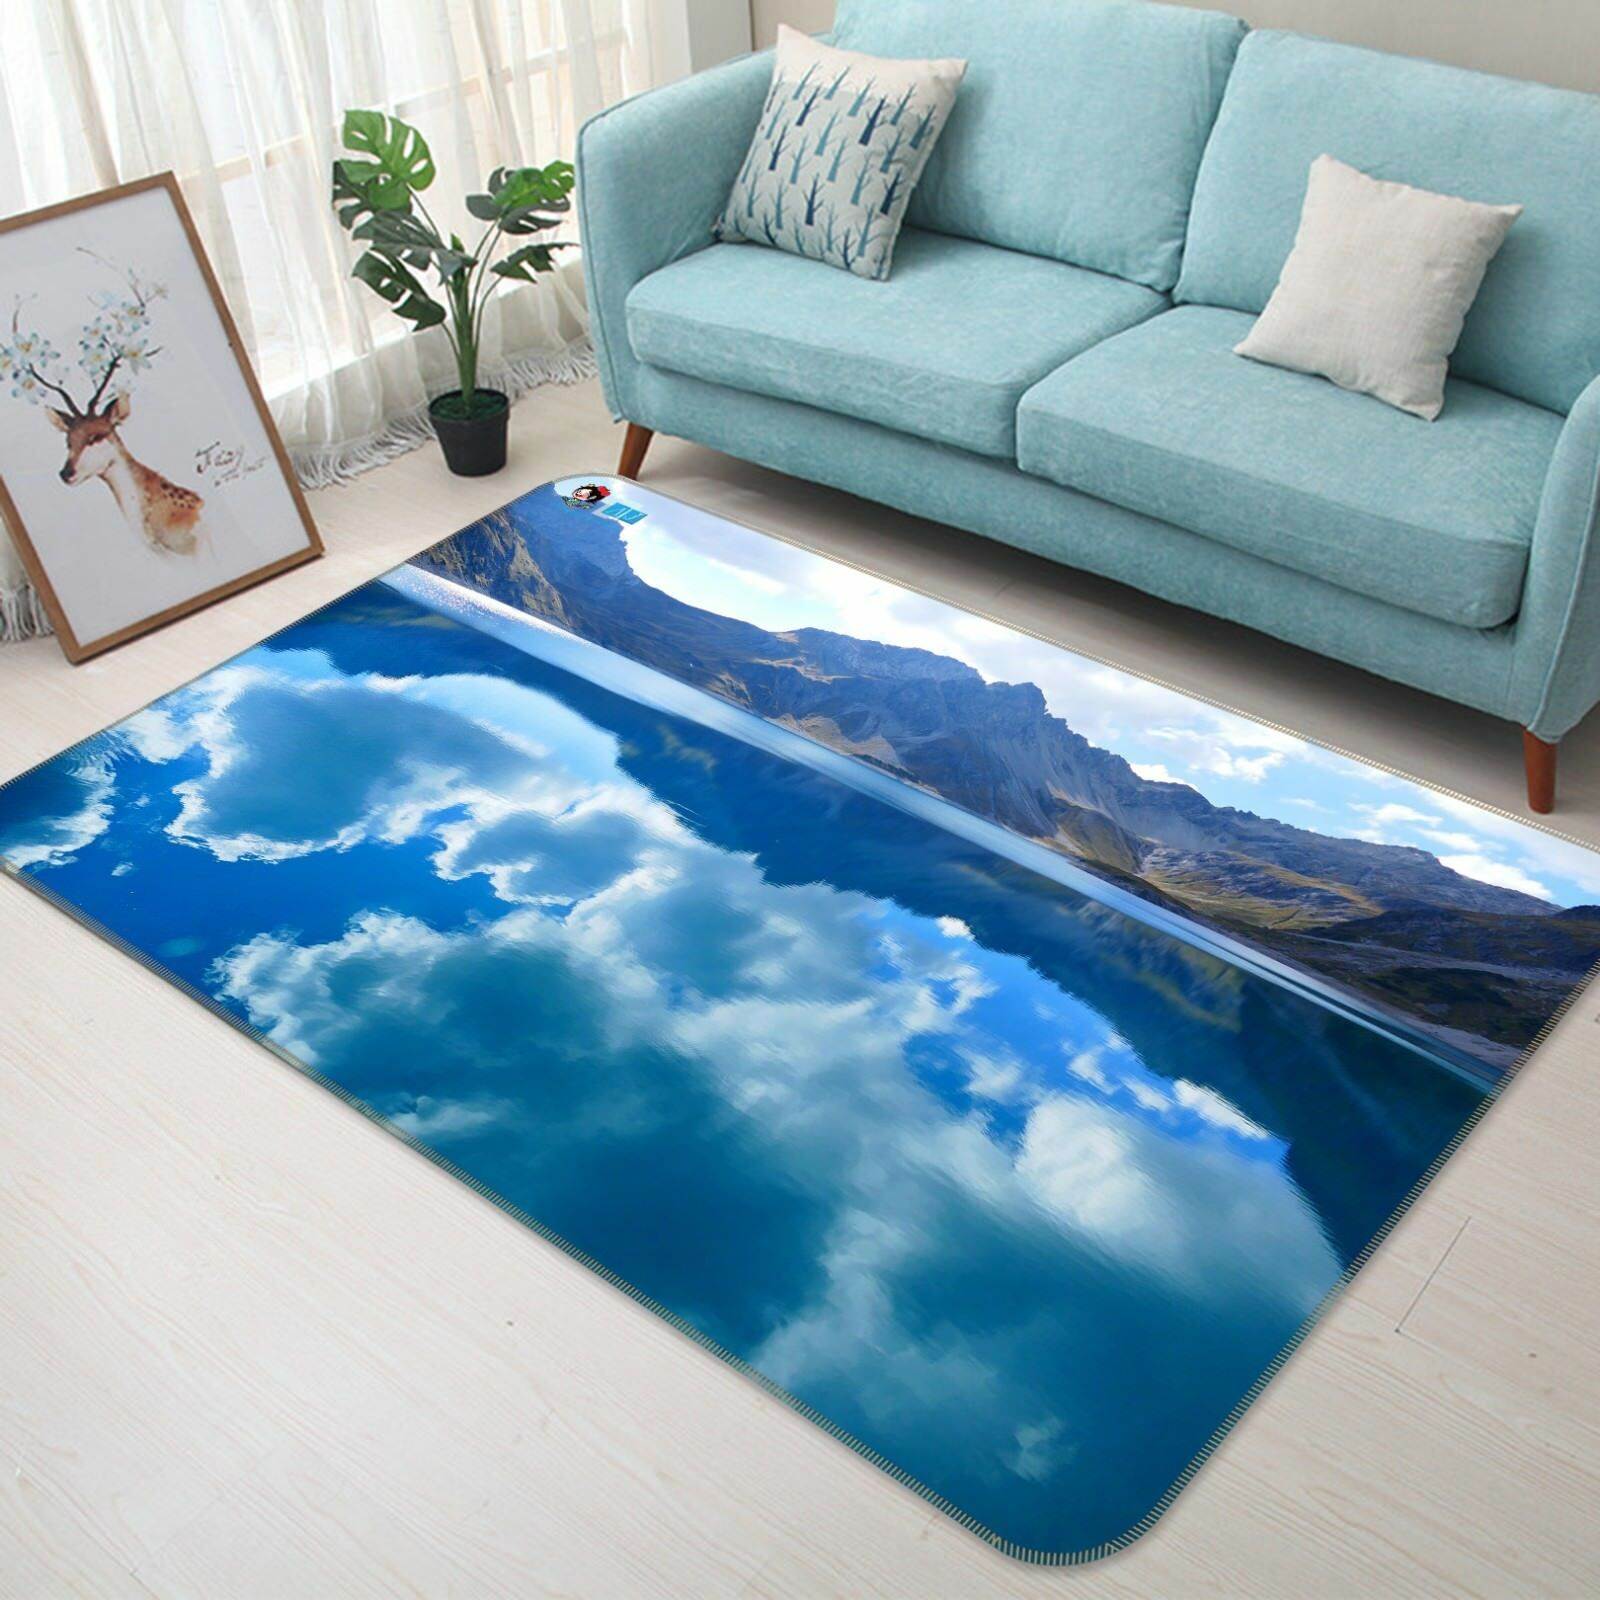 3D Calm blu Lake 2138 Non Slip Rug Mat Room Mat Quality Elegant Photo Carpet AU